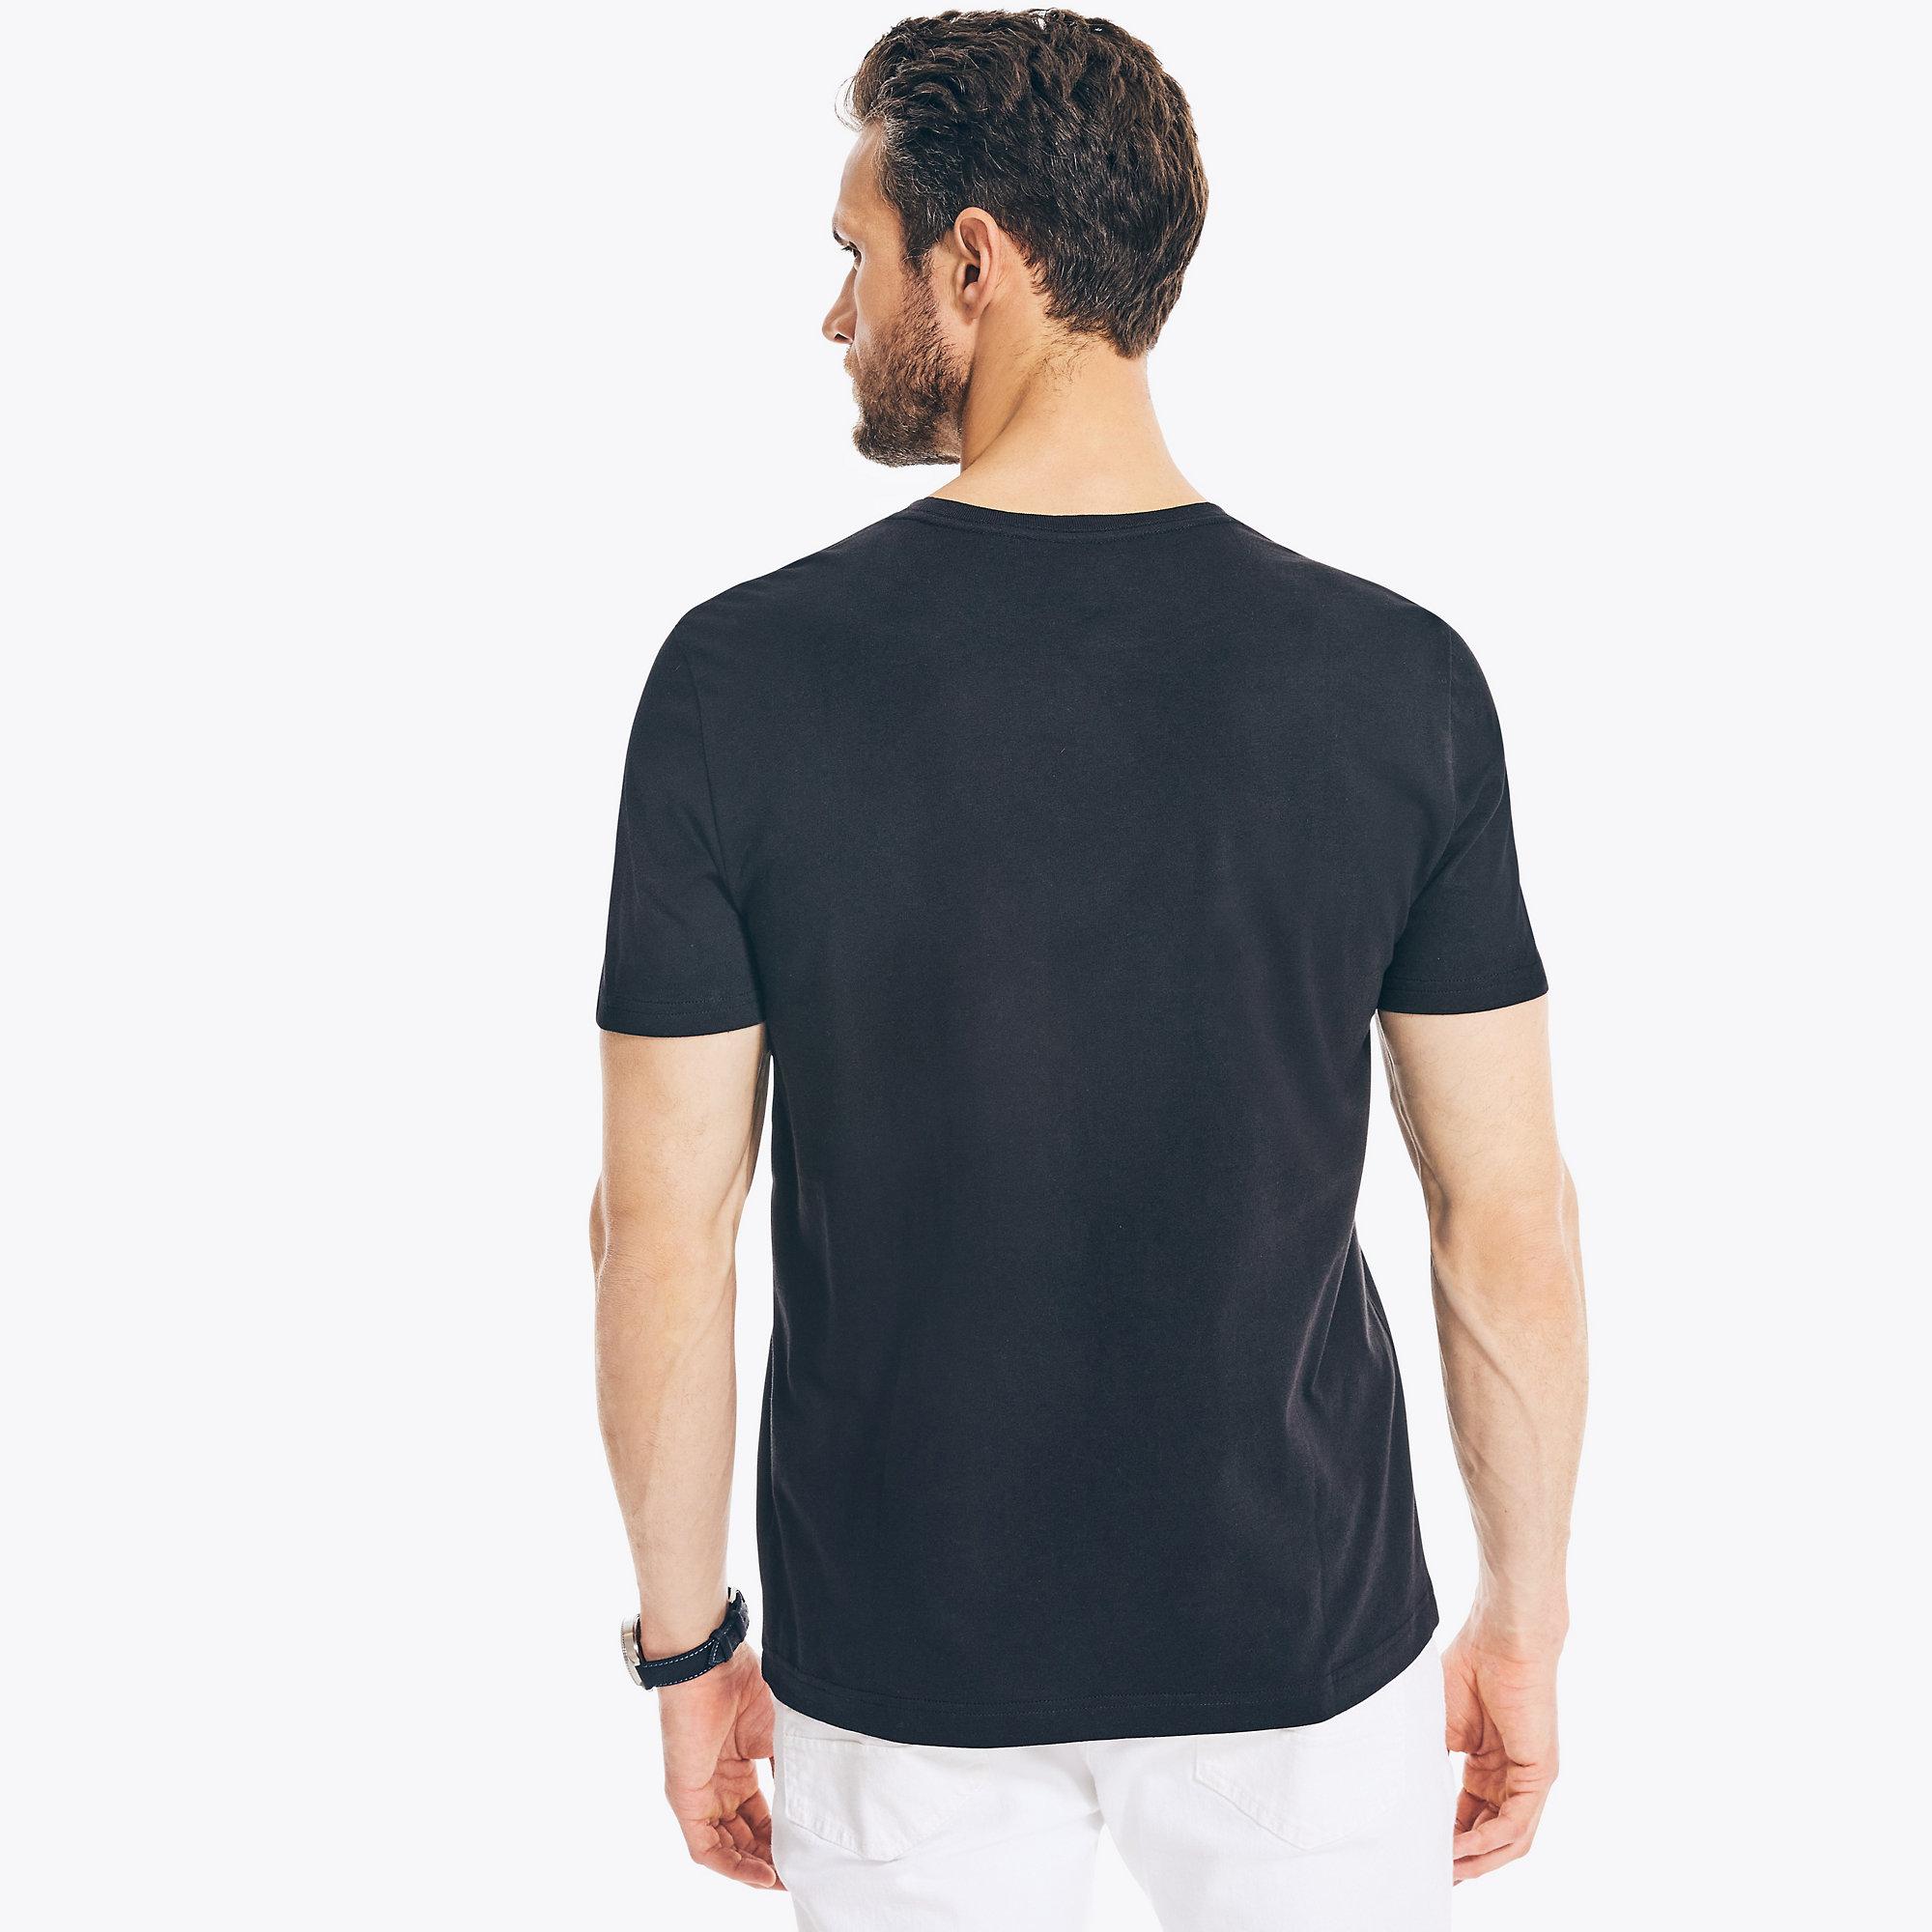 Nautica-Mens-Solid-Short-Sleeve-Crewneck-T-Shirt thumbnail 80